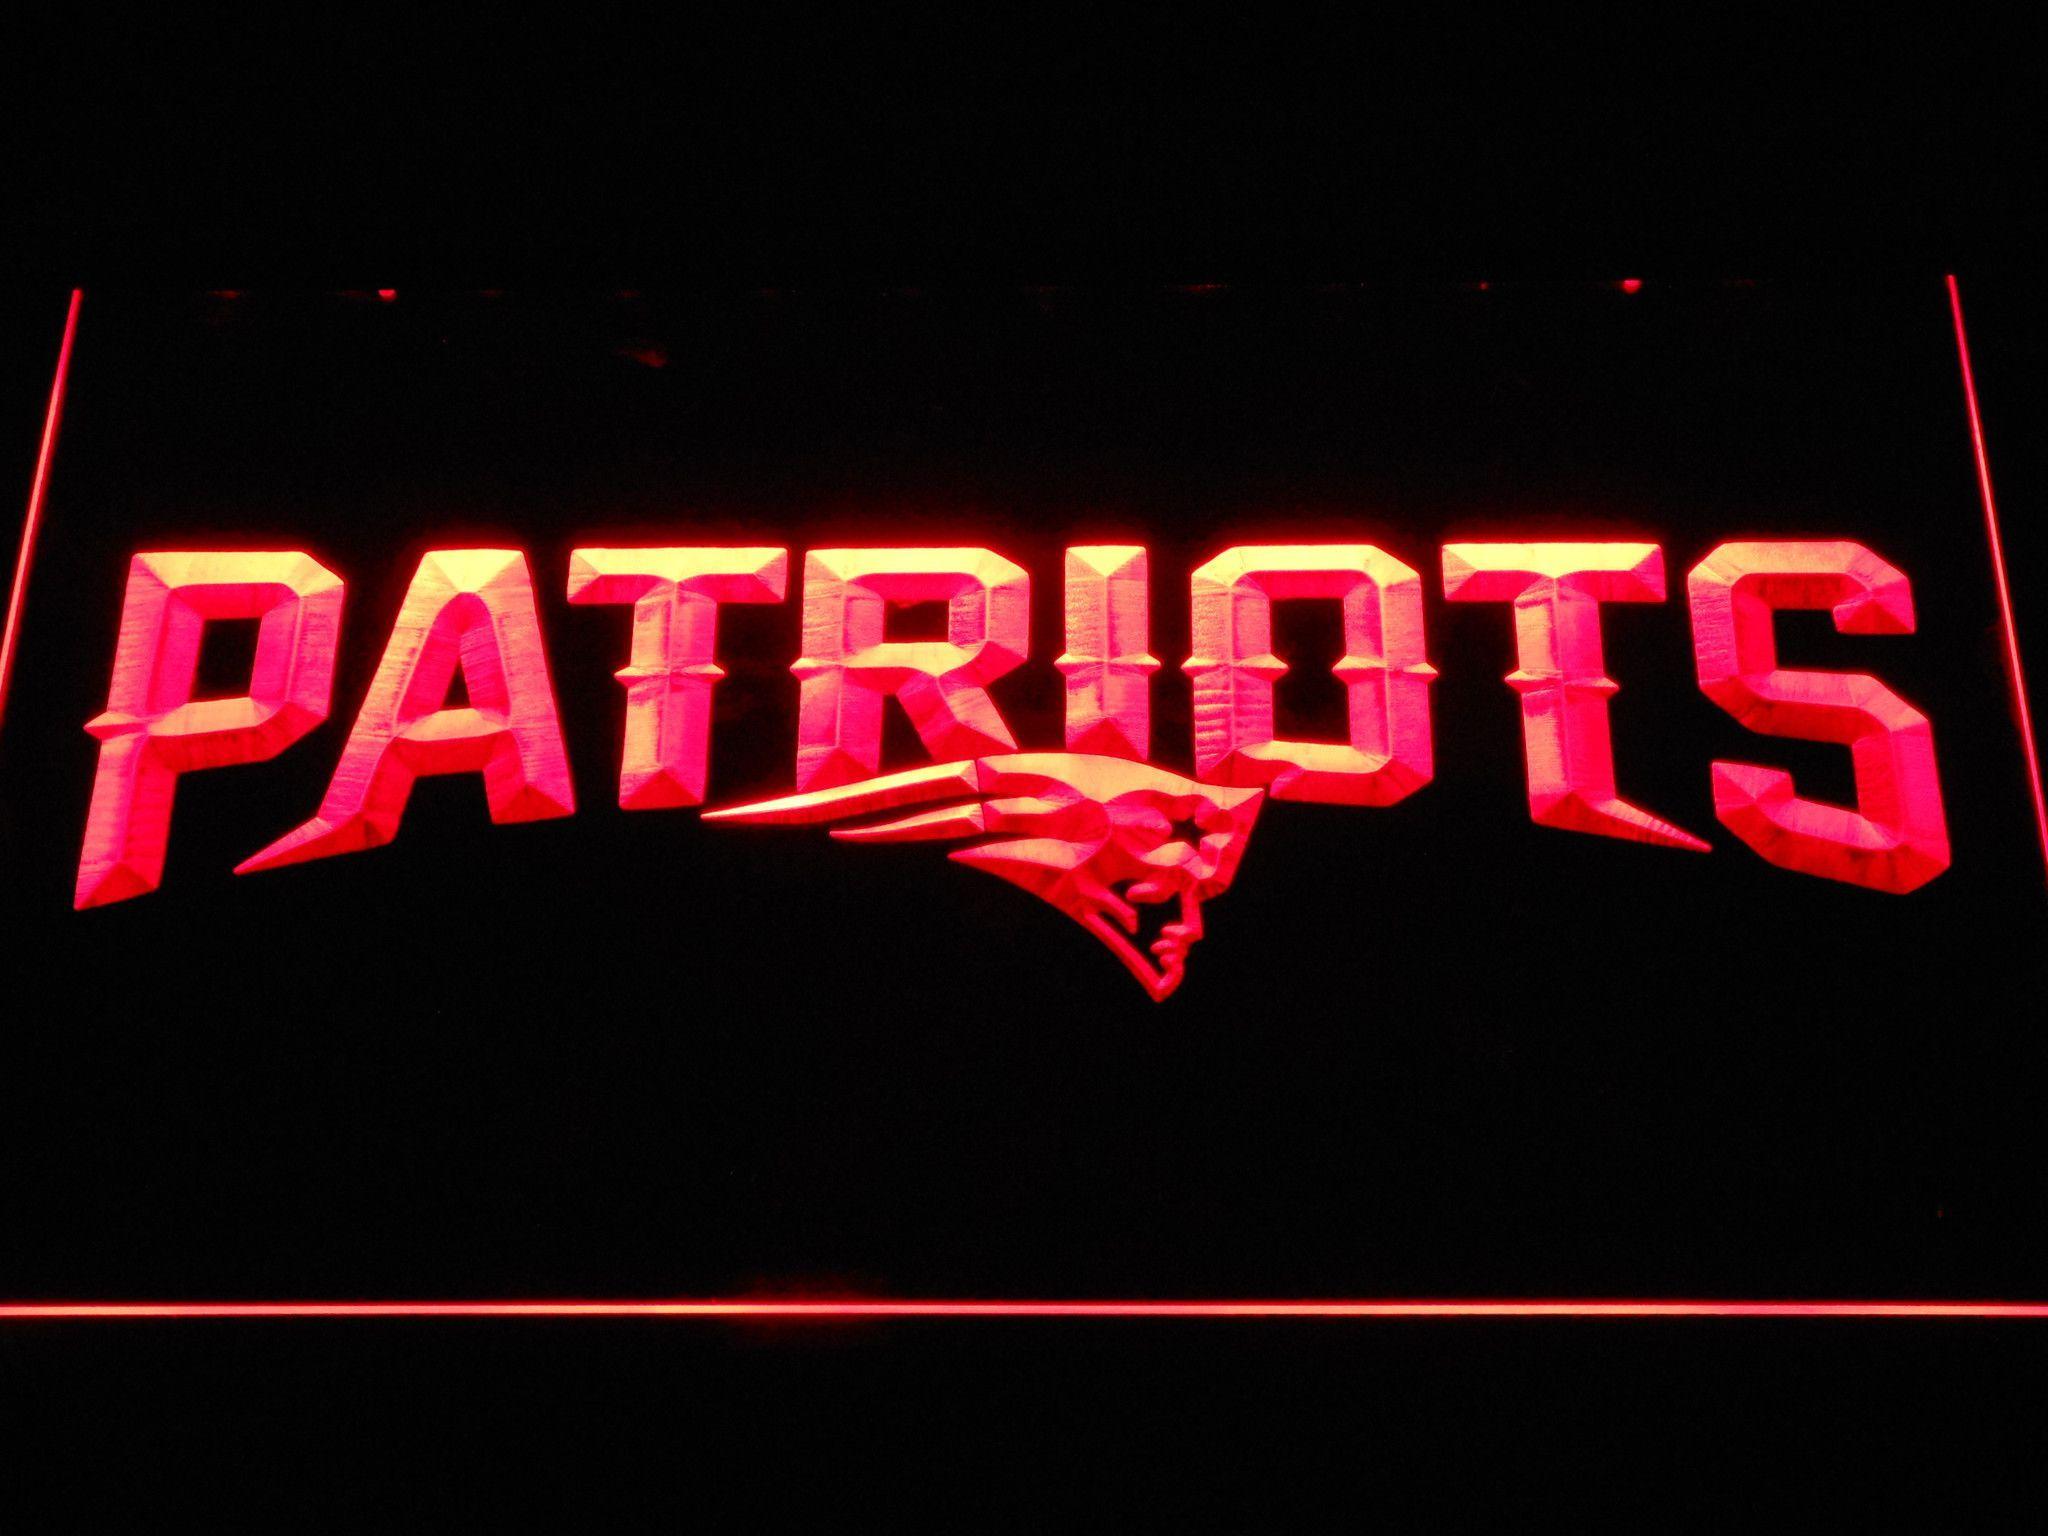 New England Patriots Wordmark Led Neon Sign Led Neon Signs Neon Signs New England Patriots